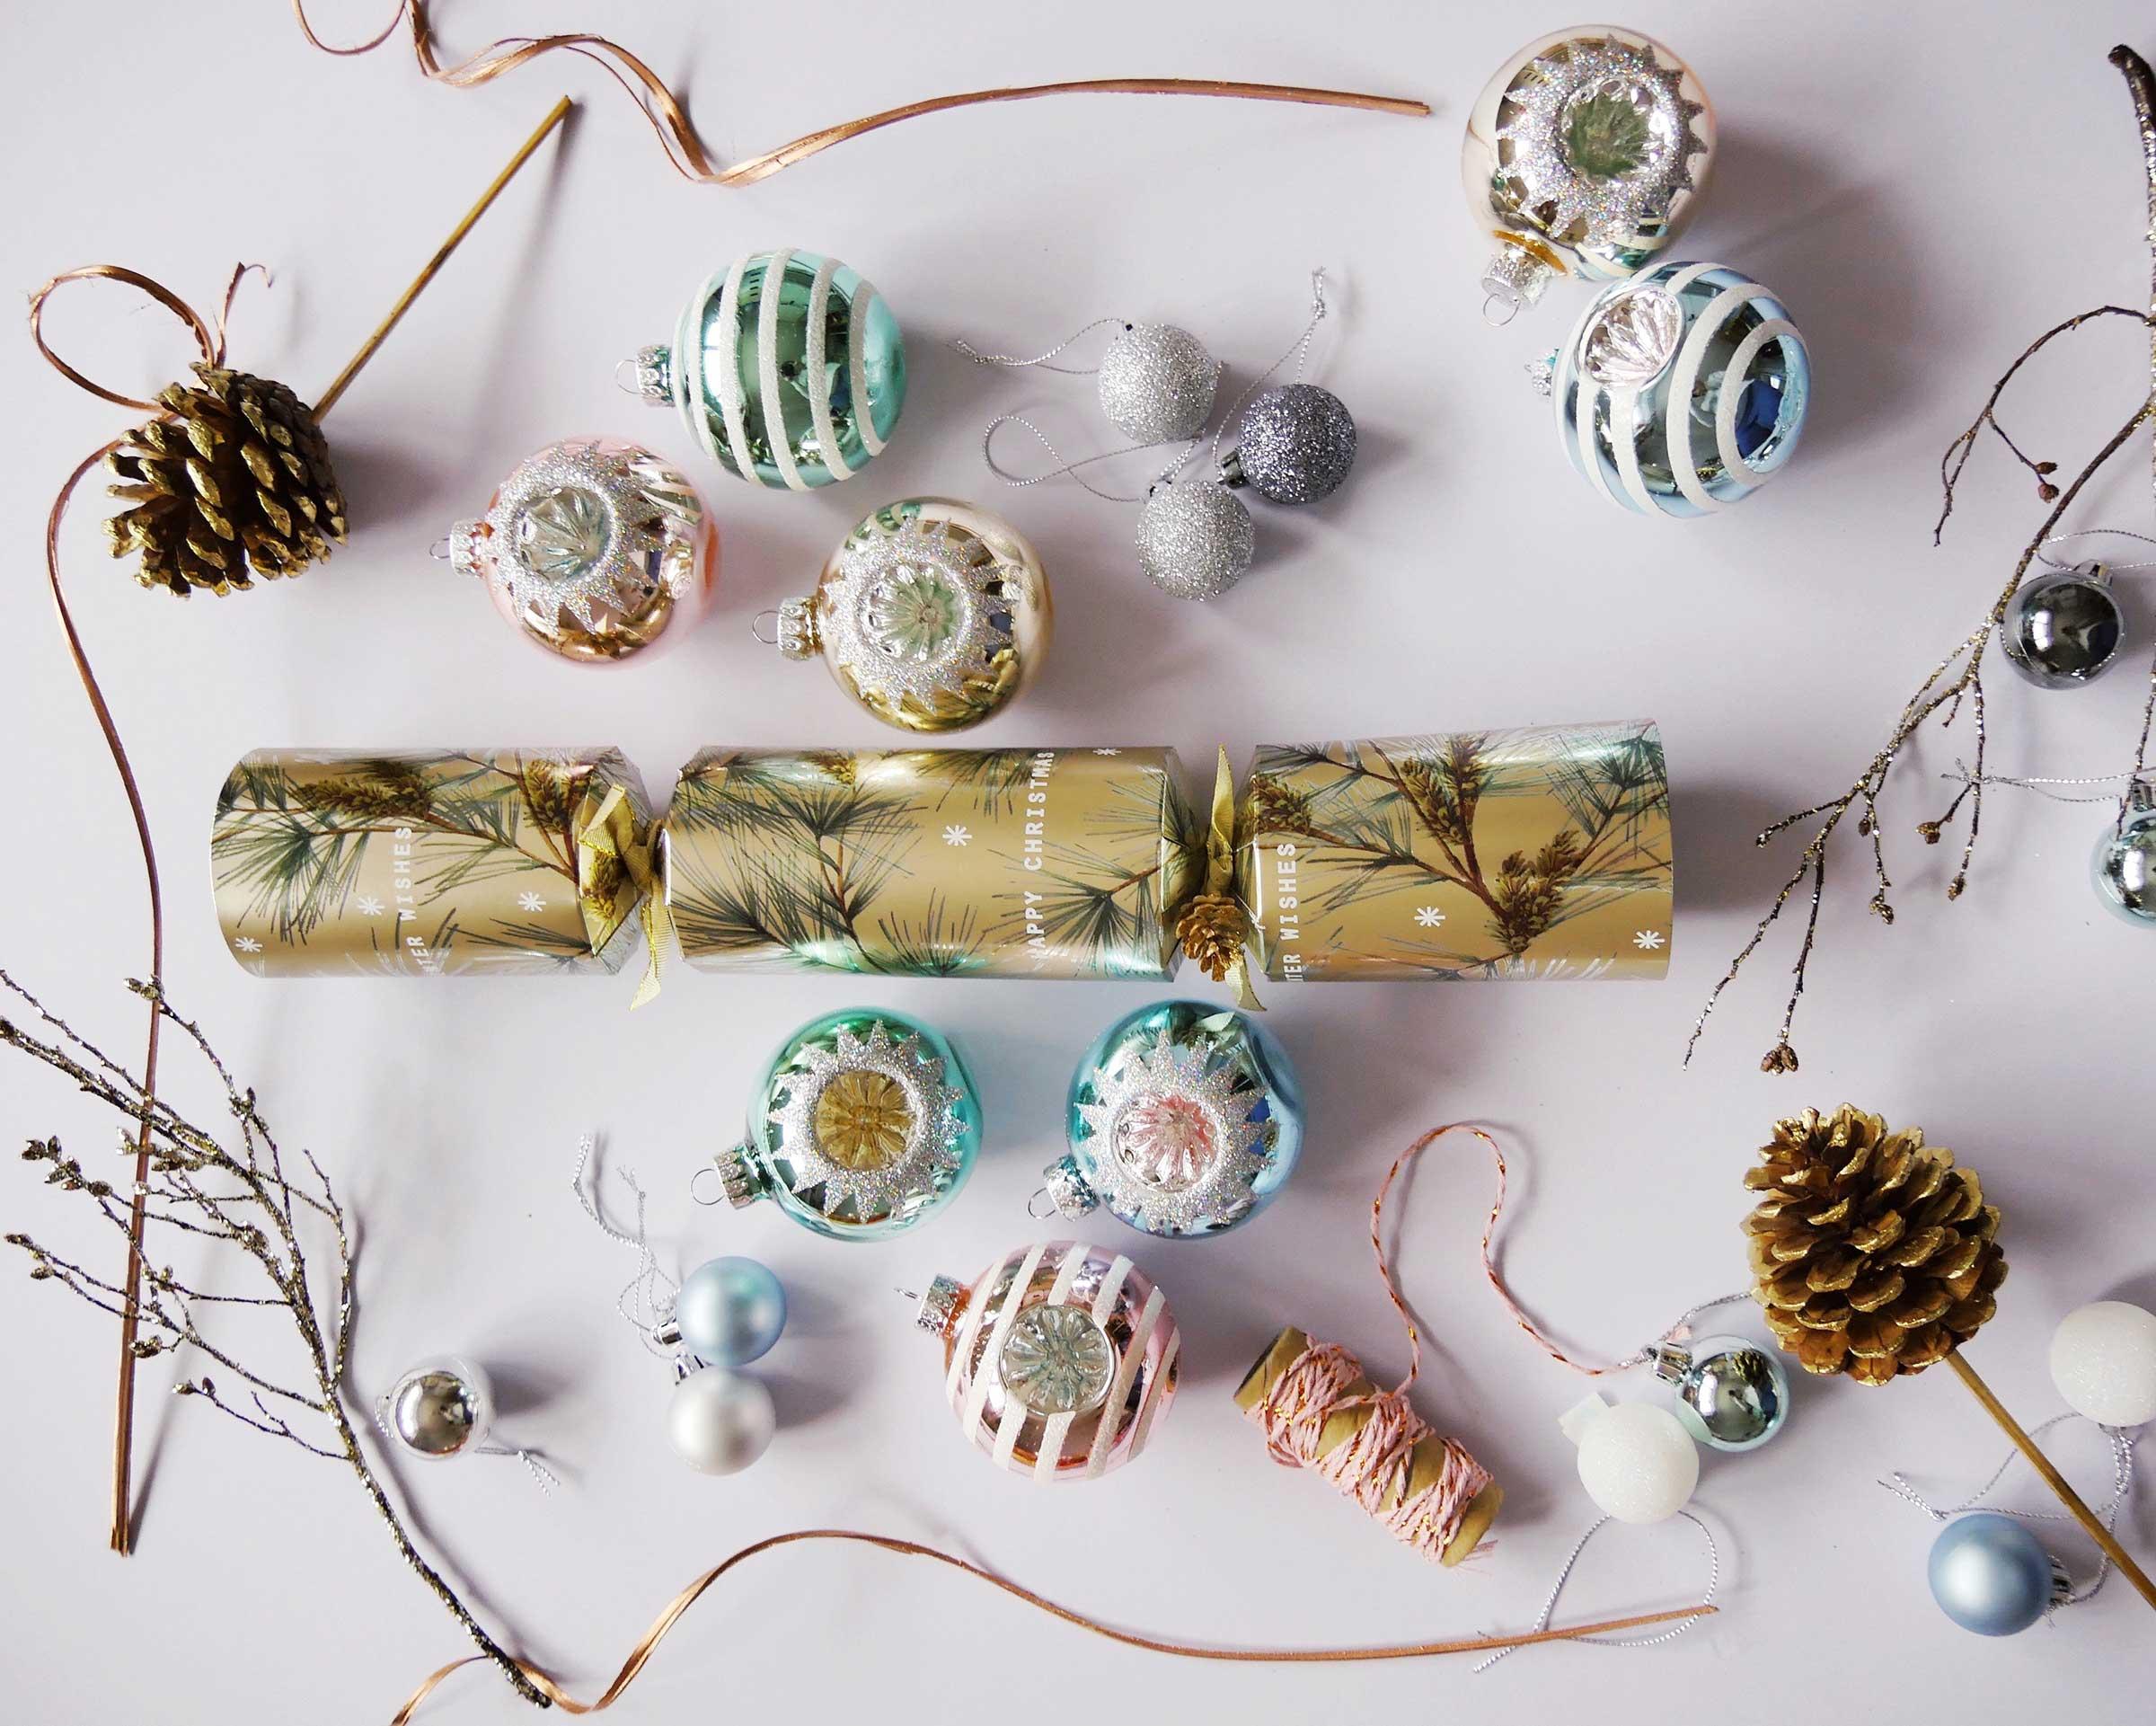 Les-Naly-Holiday-Christmas-Desk-Office.jpg